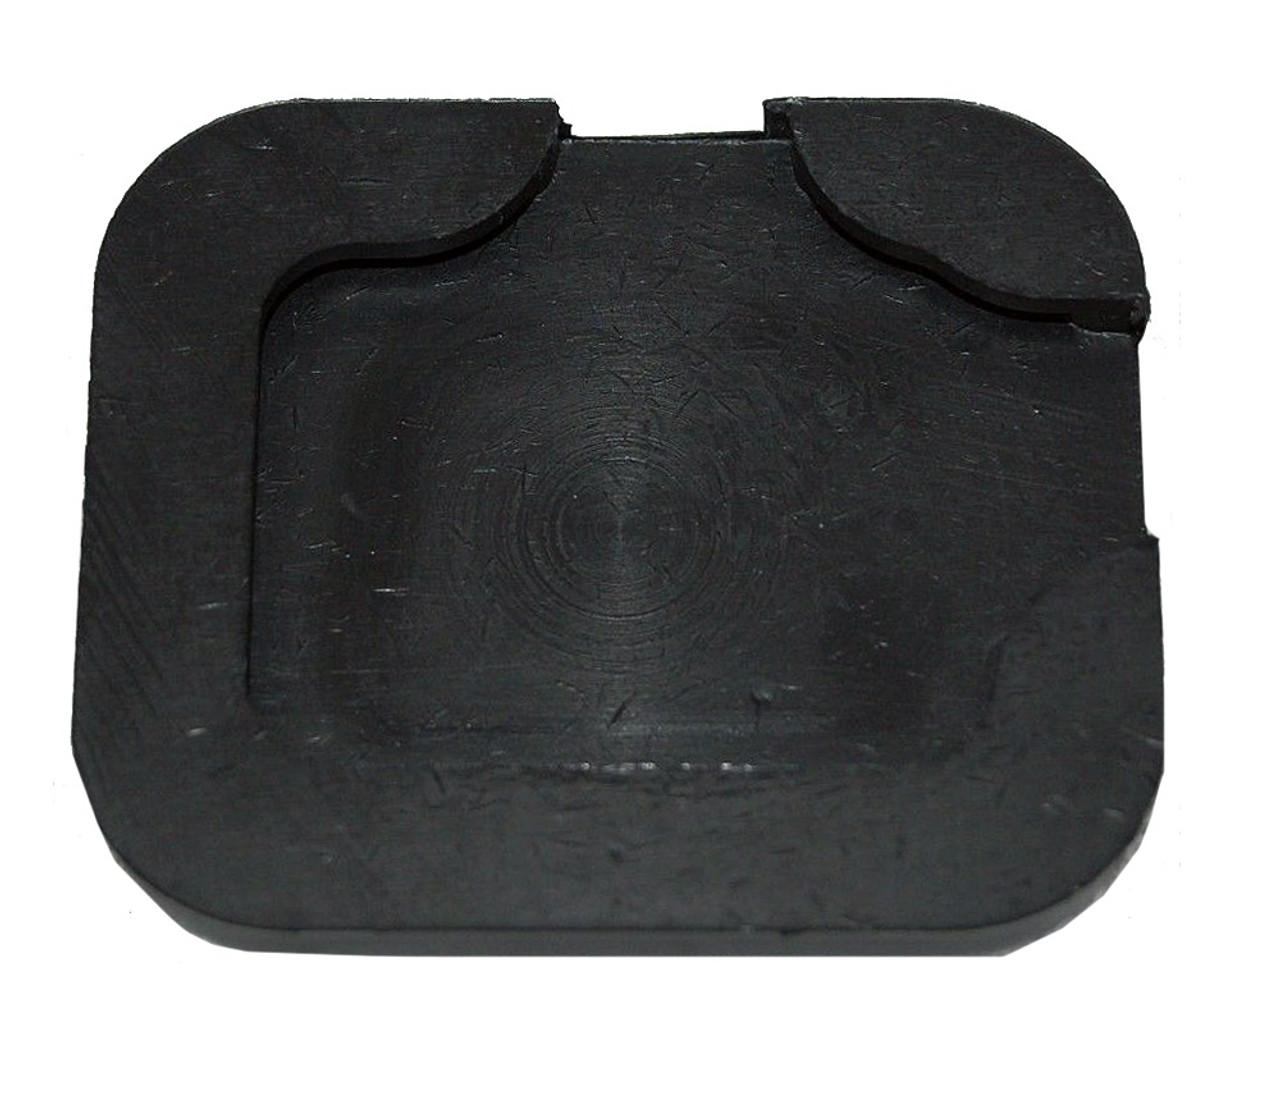 Clutch Pedal Pad 1963-1986